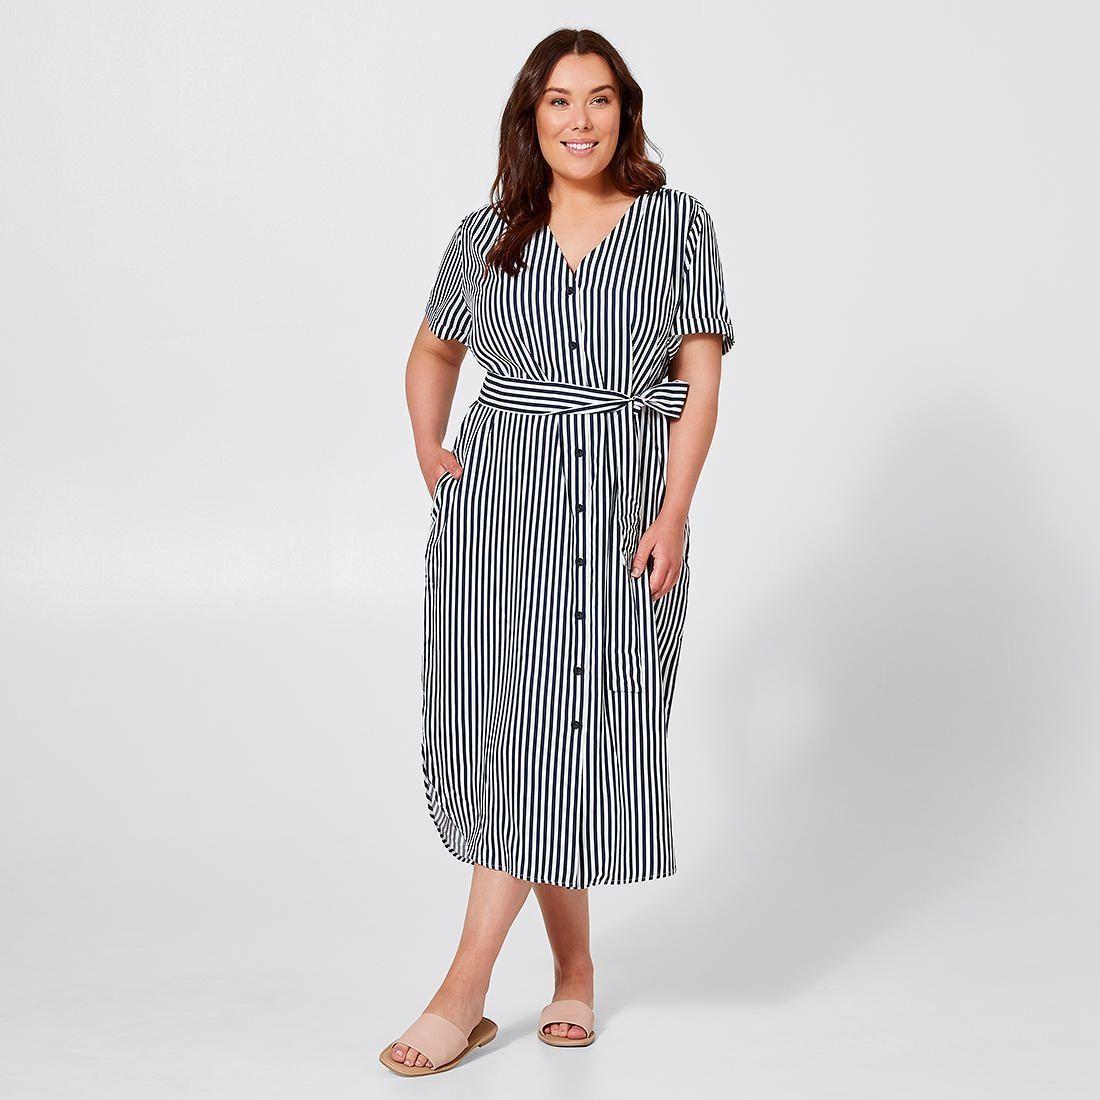 Belle Curve Striped Maxi Dress Navy White Stripe Target Australia Maxi Dress Navy Striped Maxi Dresses Striped Maxi [ 1100 x 1100 Pixel ]